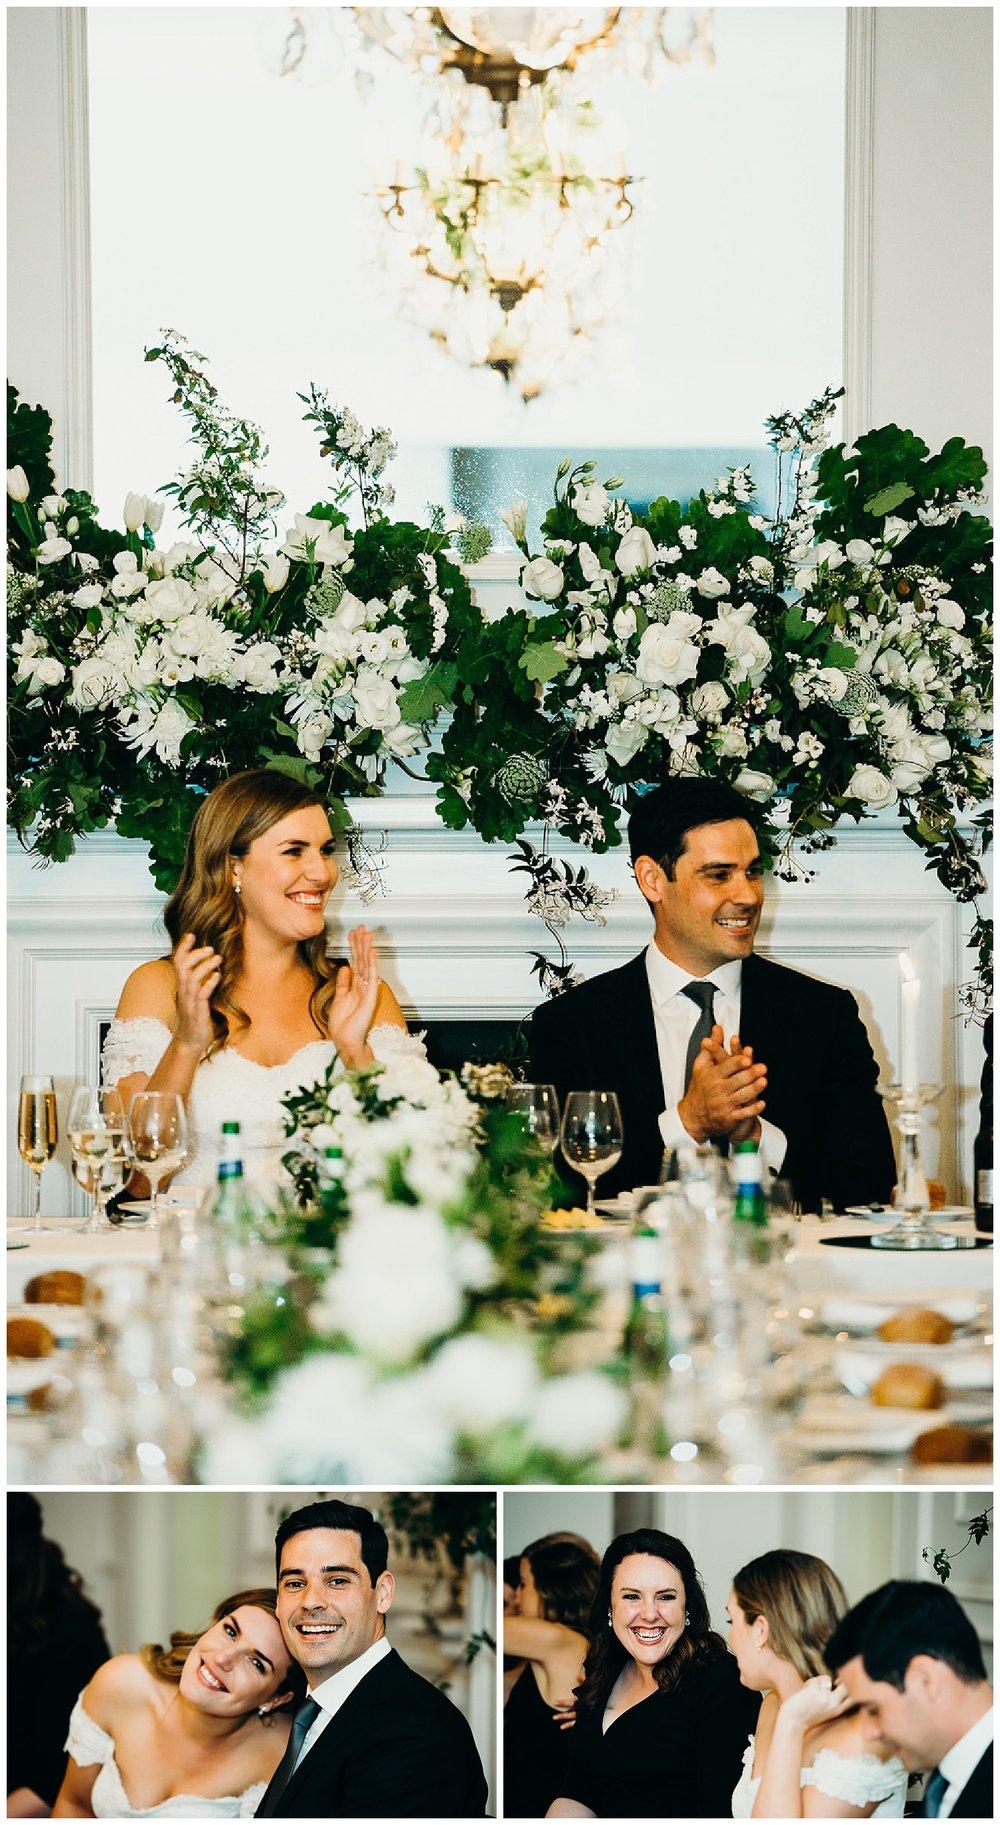 Zoe McMahon Photographer - Hopewood House - Wedding Day Photography - Georgie and David - Collage31.jpg